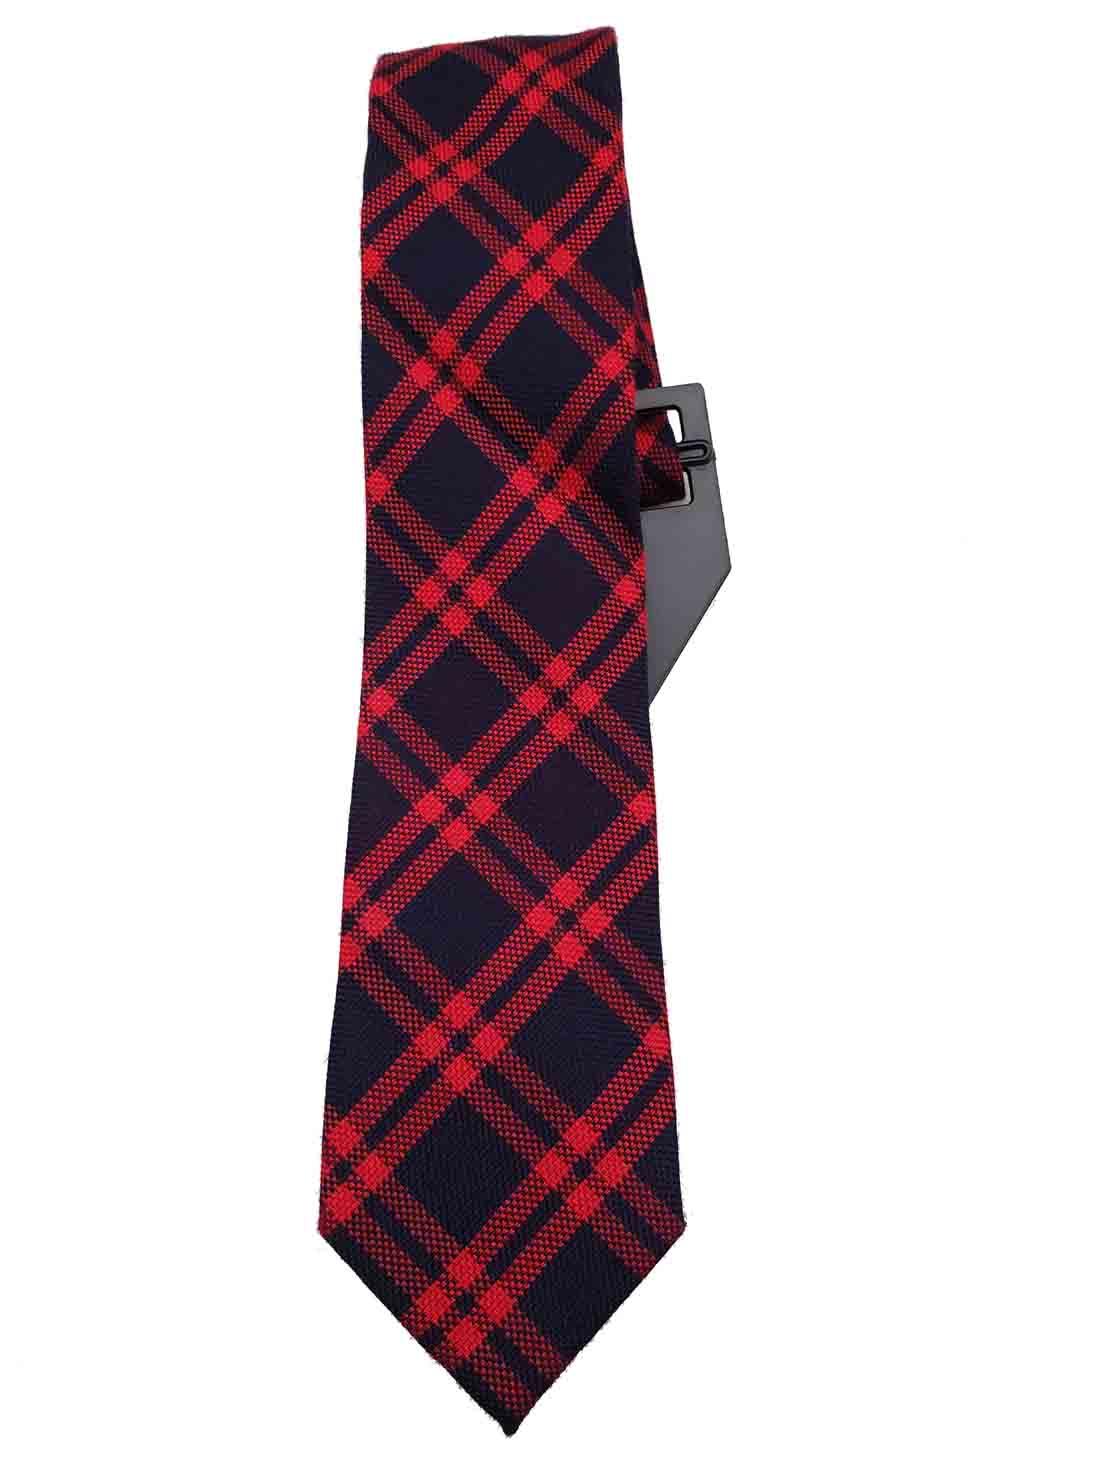 Narrow Red Navy Blue Plaid Tie Cotton Blend Men's Long Cedar Wood State